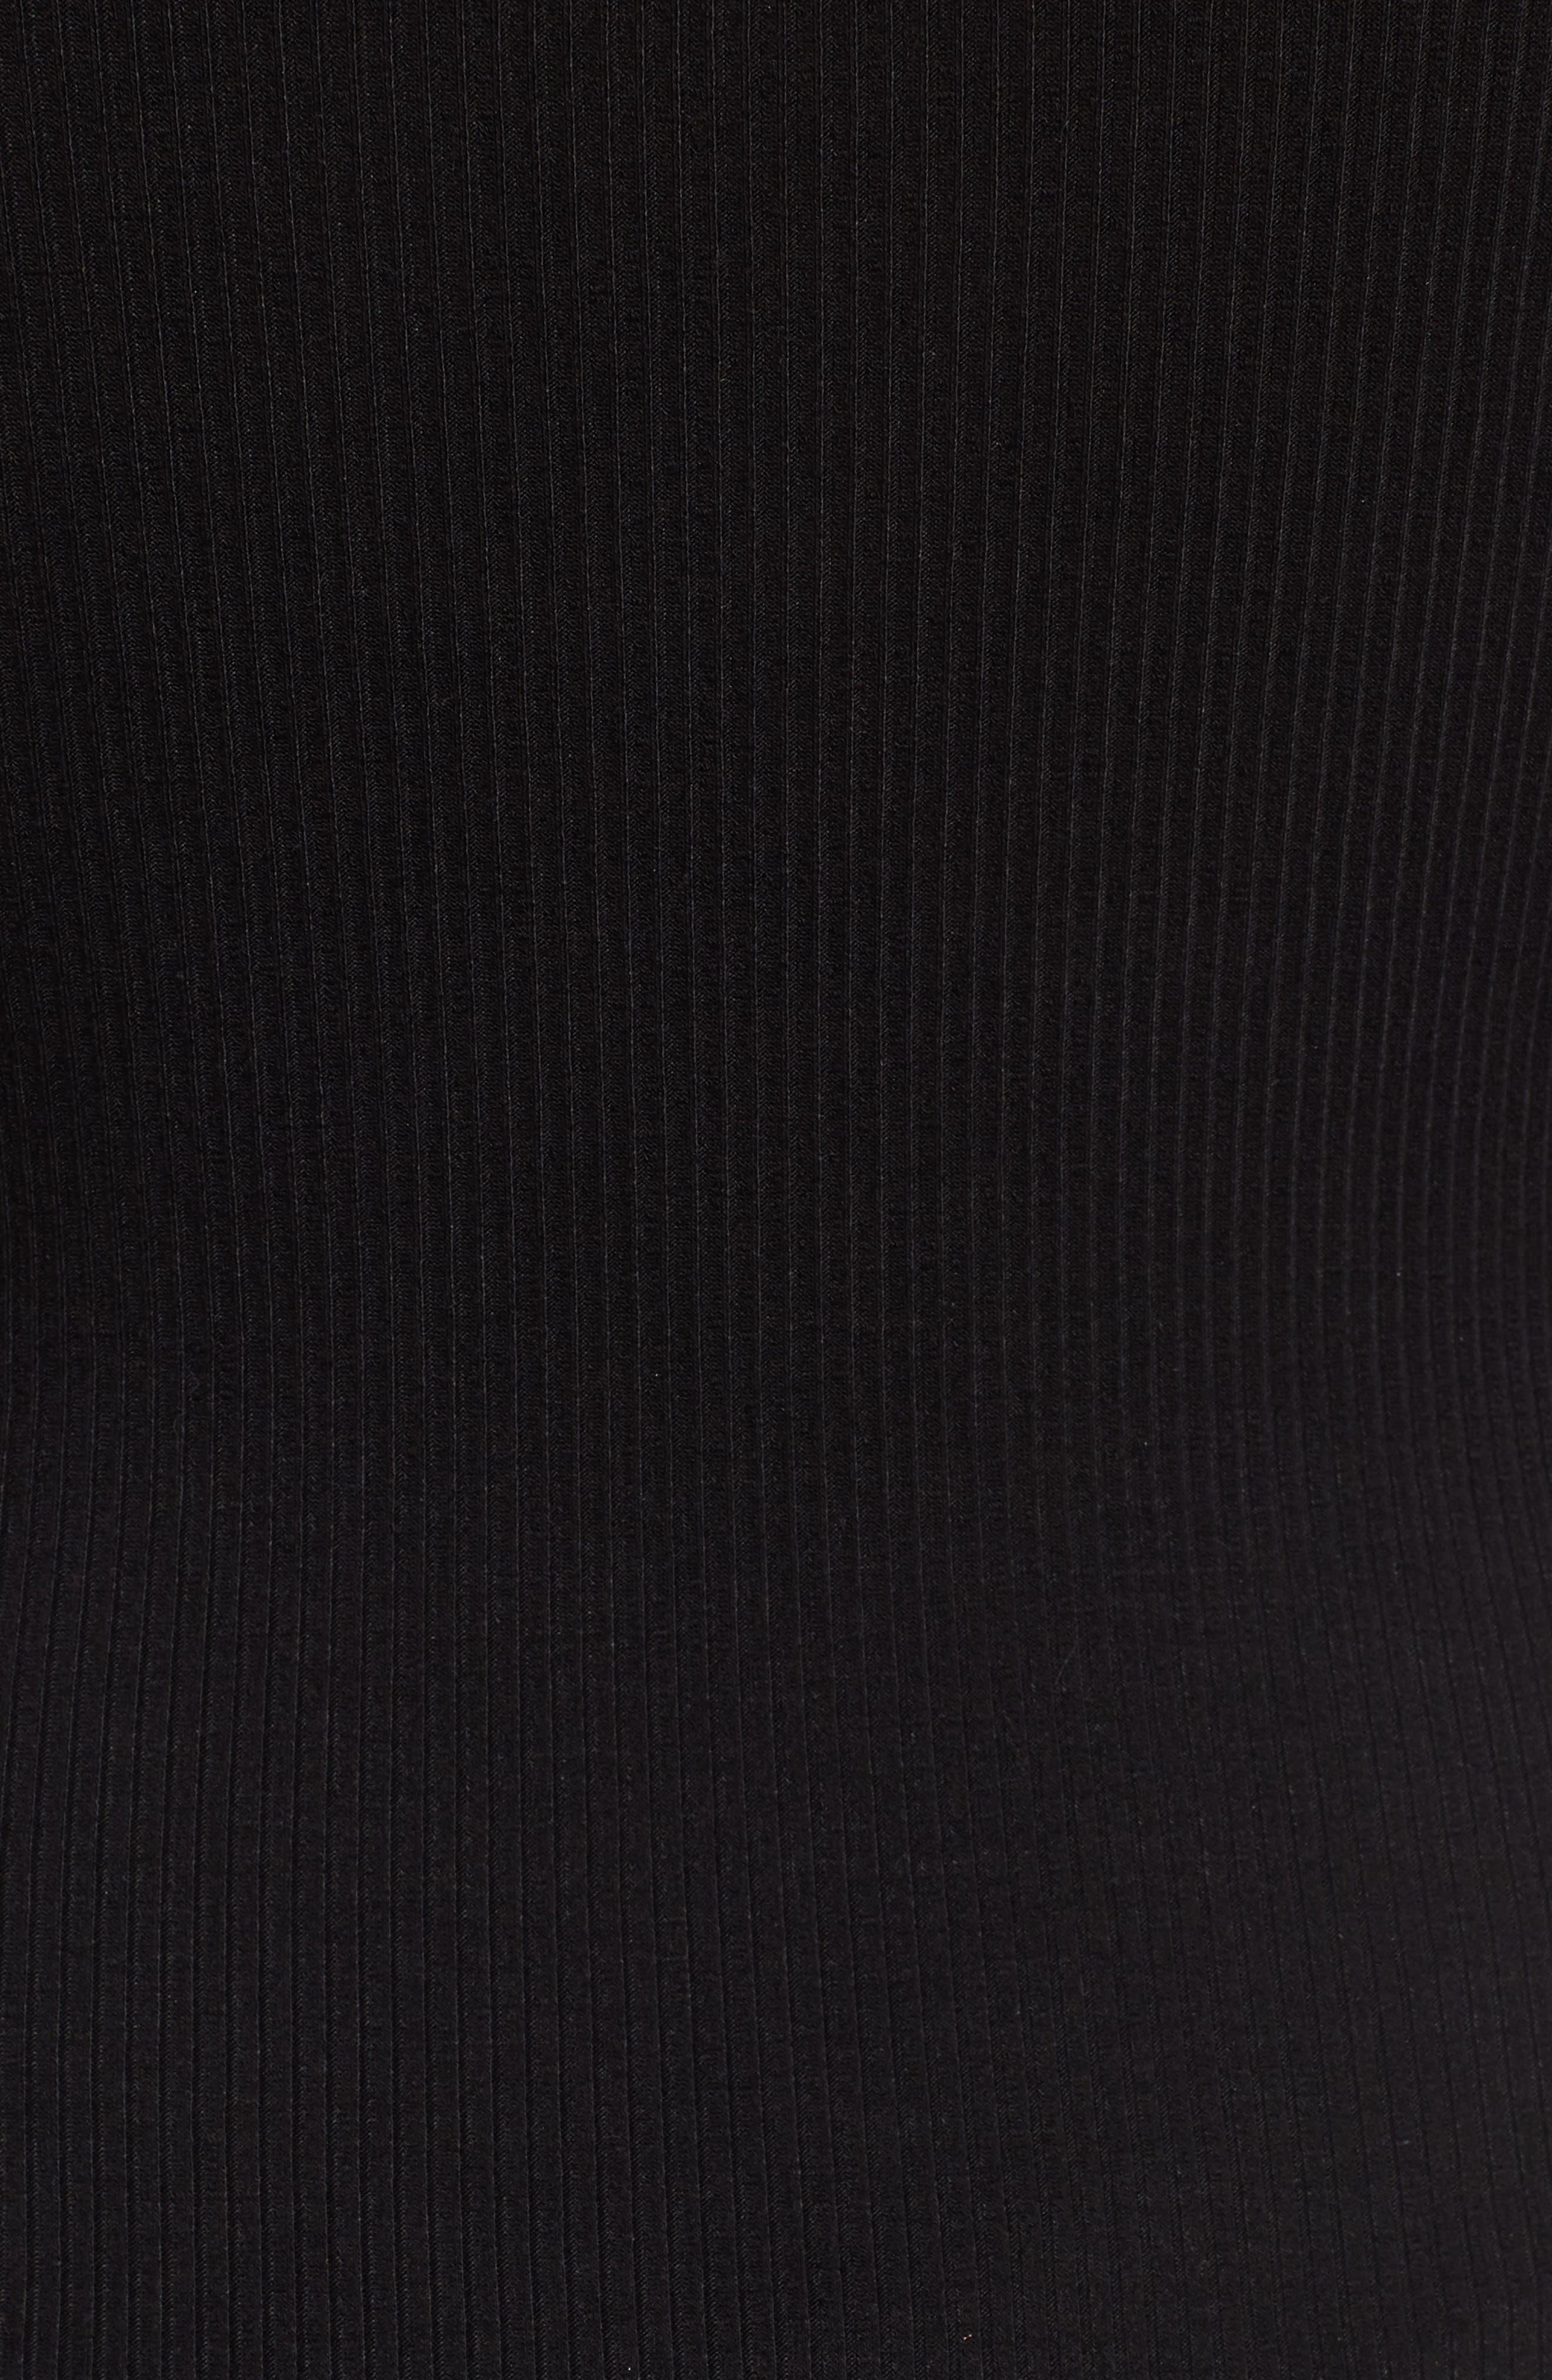 Ruffle Strap Bodysuit,                             Alternate thumbnail 5, color,                             001